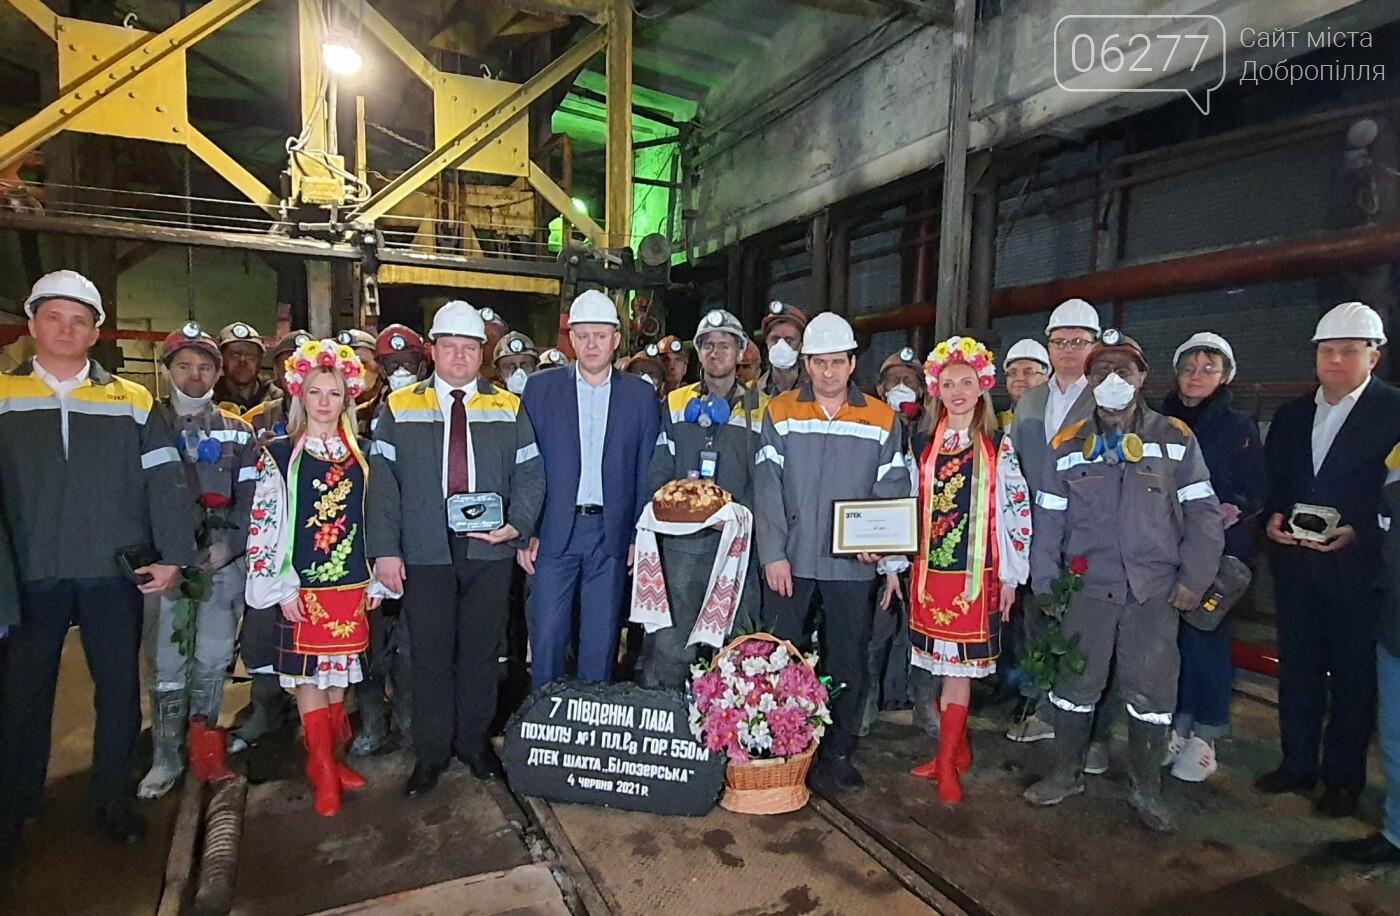 На ДТЭК шахте Белозерская запустили лаву-гигант, фото-1